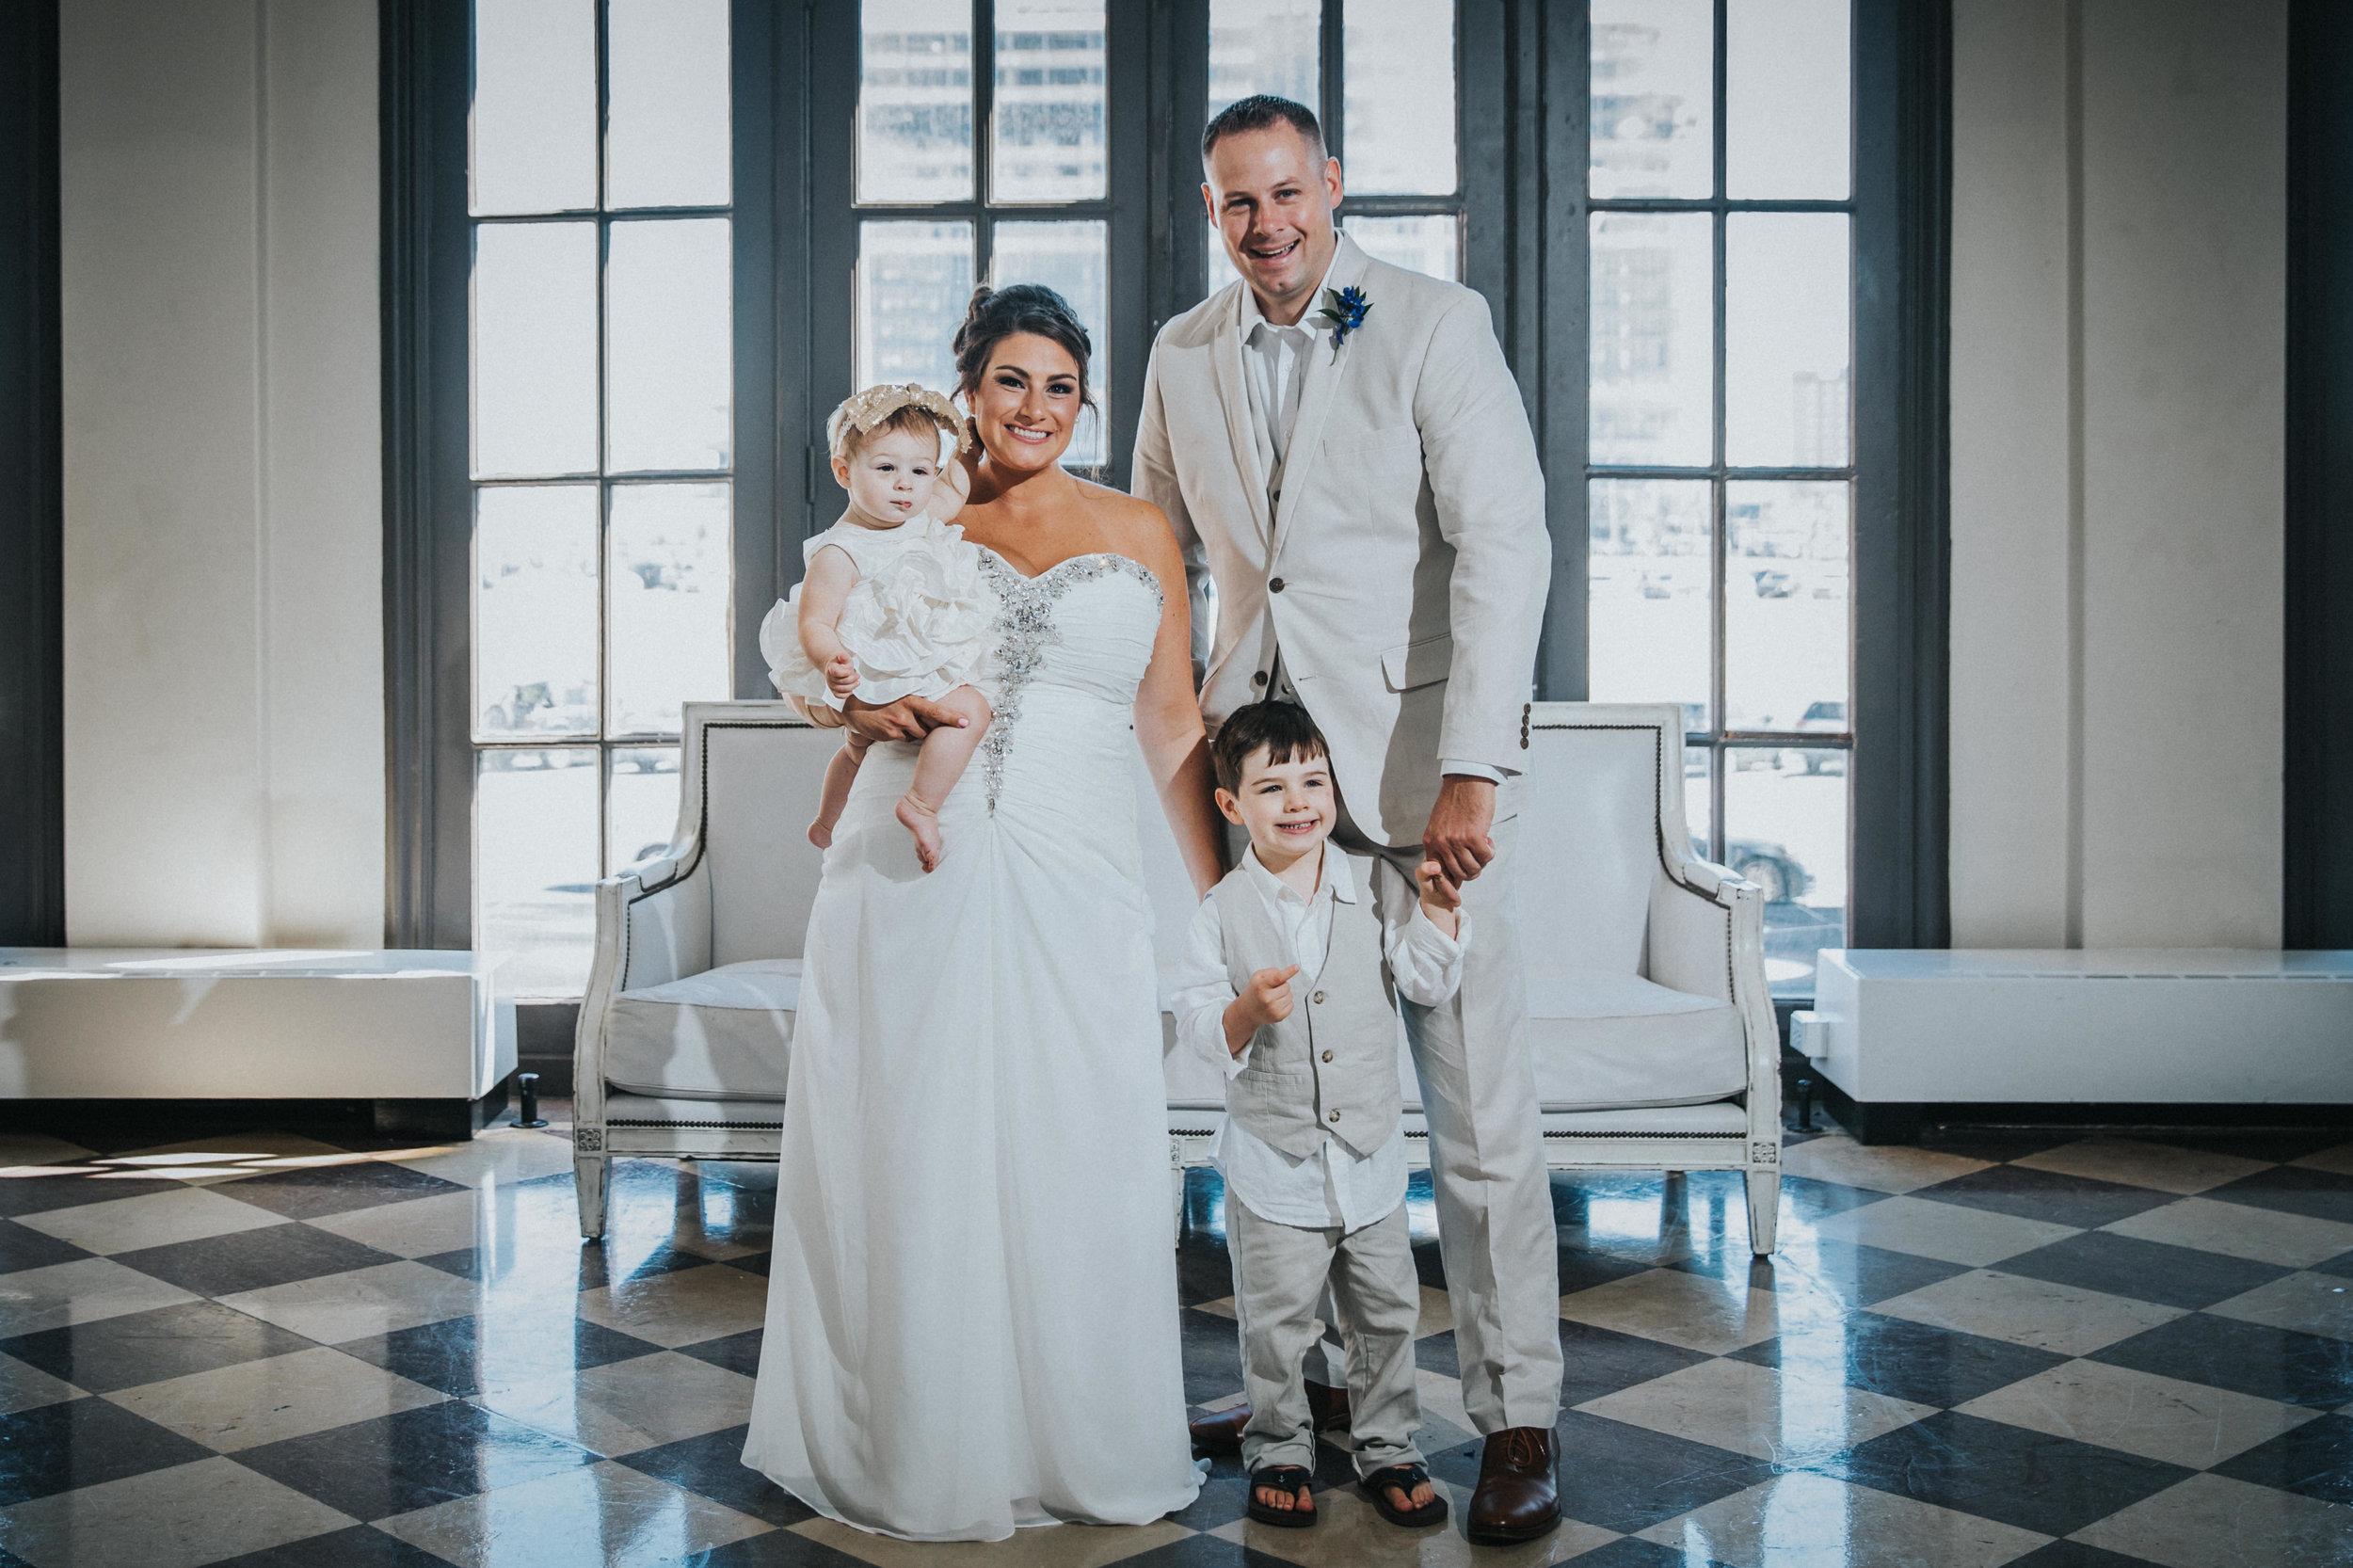 JennaLynnPhotography-NJWeddingPhotographer-Wedding-TheBerkeley-AsburyPark-Allison&Michael-Formals-43.jpg